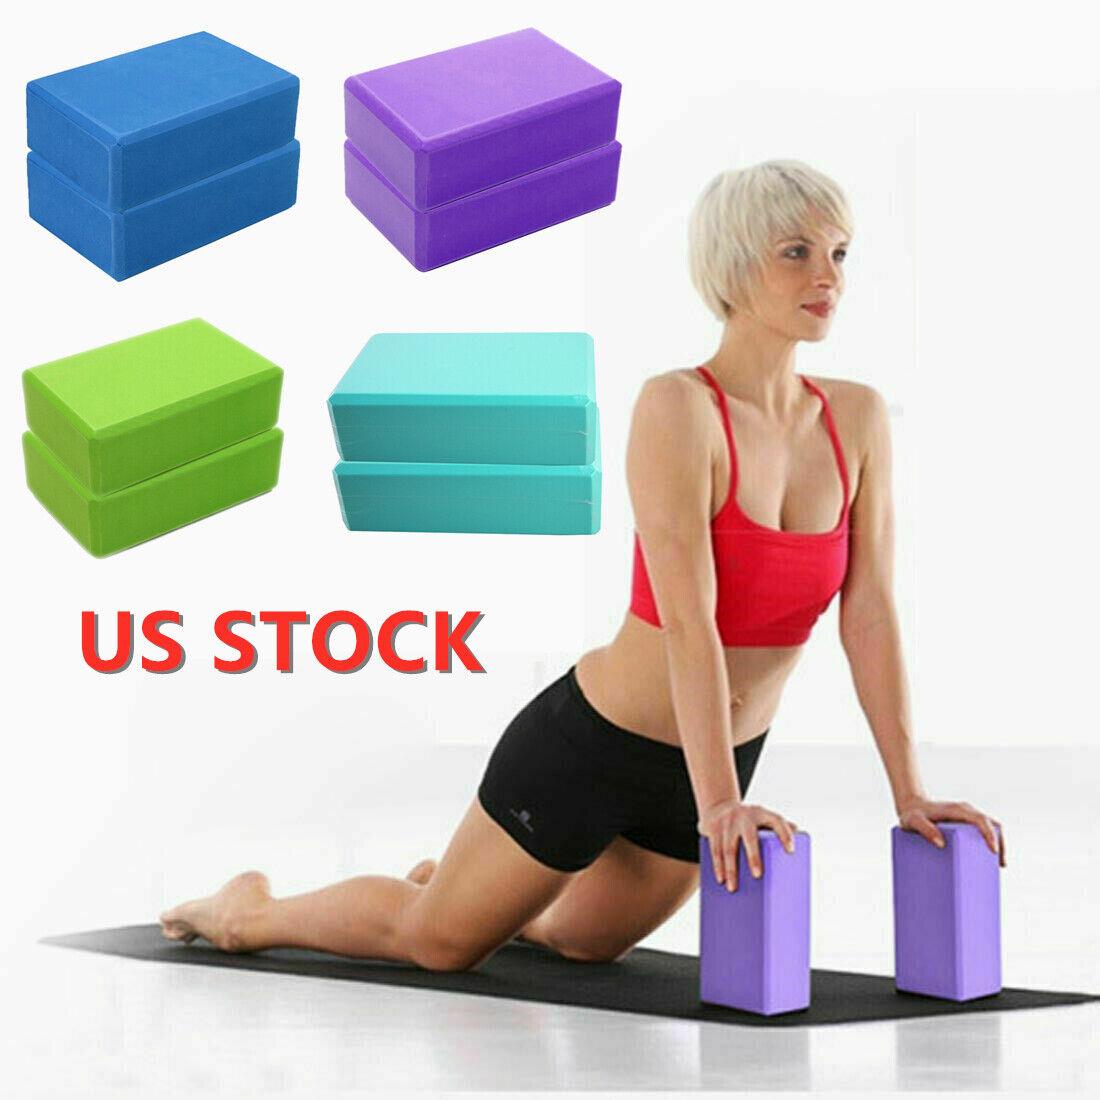 2pc Yoga Fitness Block Foam Brick Sports Pilates Gym Workout Exercise Stretching